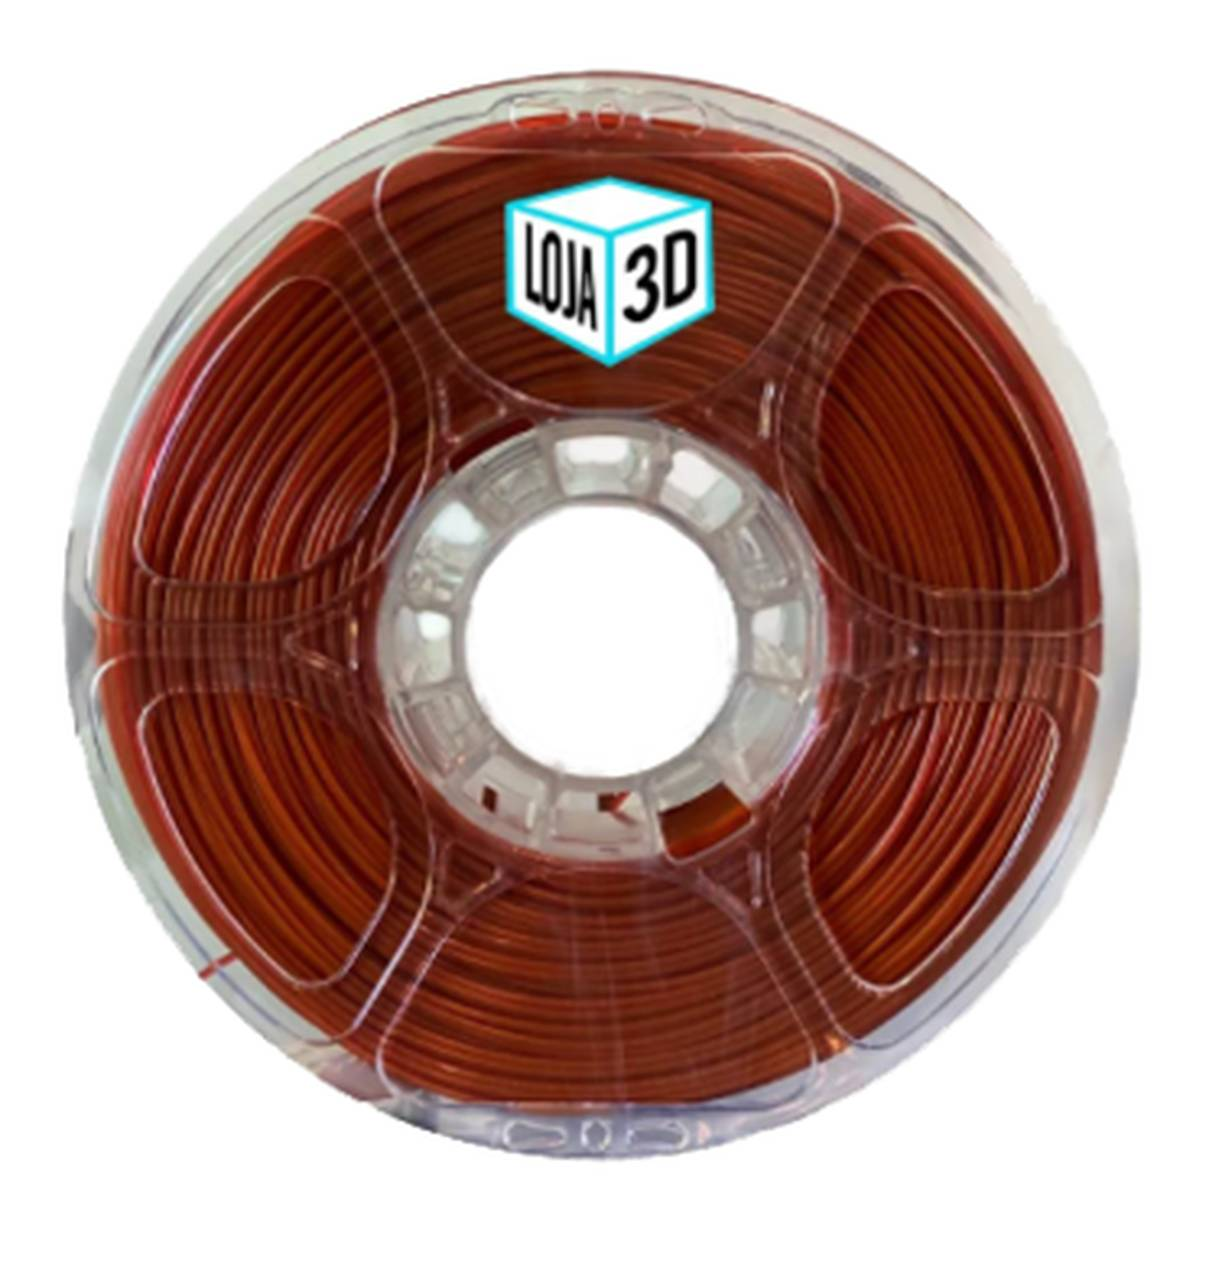 Filamento PET-G Pro - Caramelo - Loja 3D - 1.75mm - 1kg